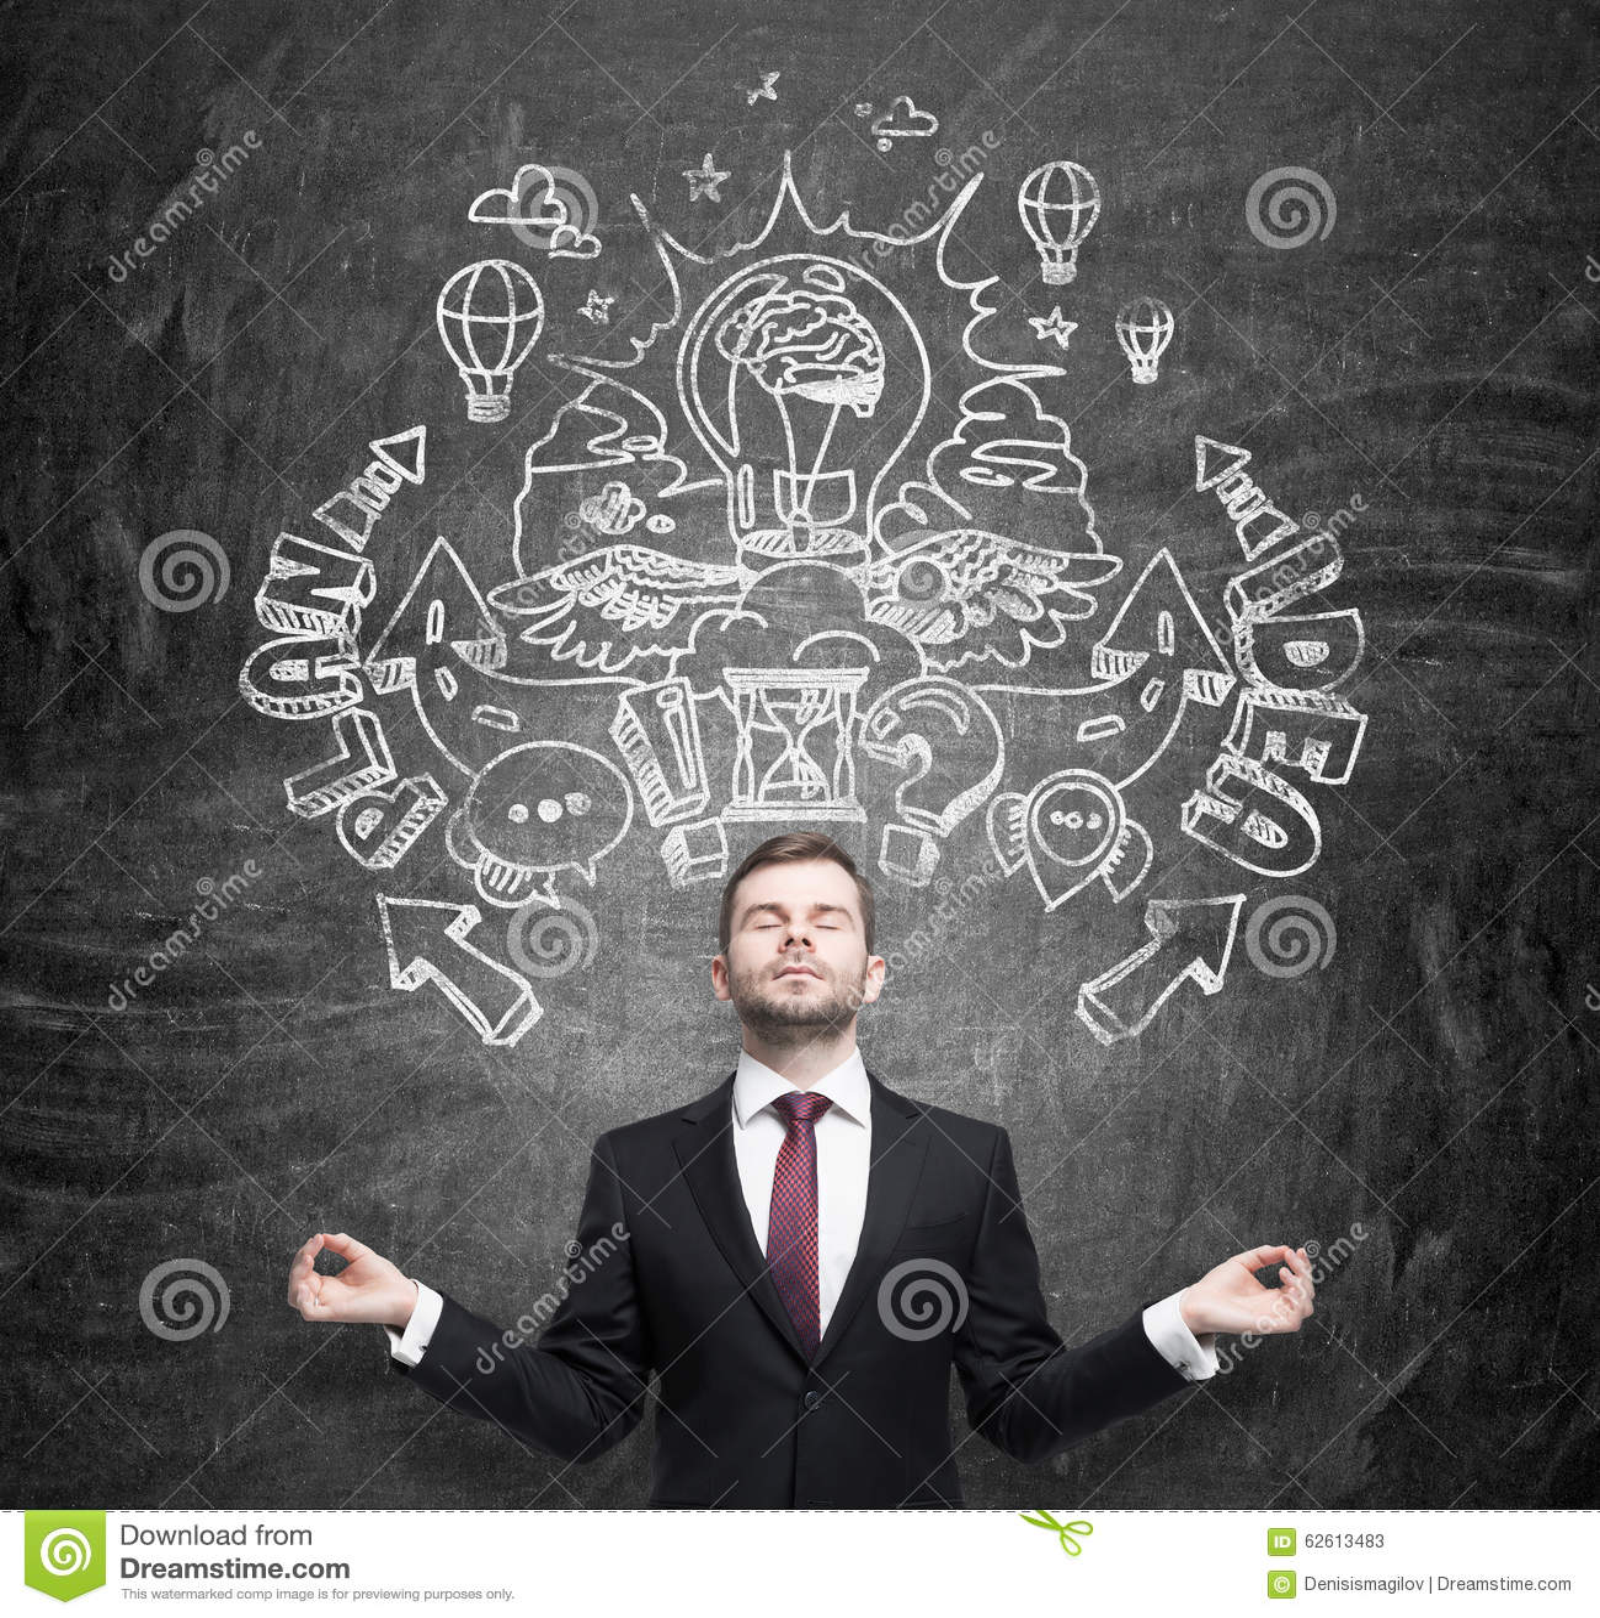 Idea of business plan